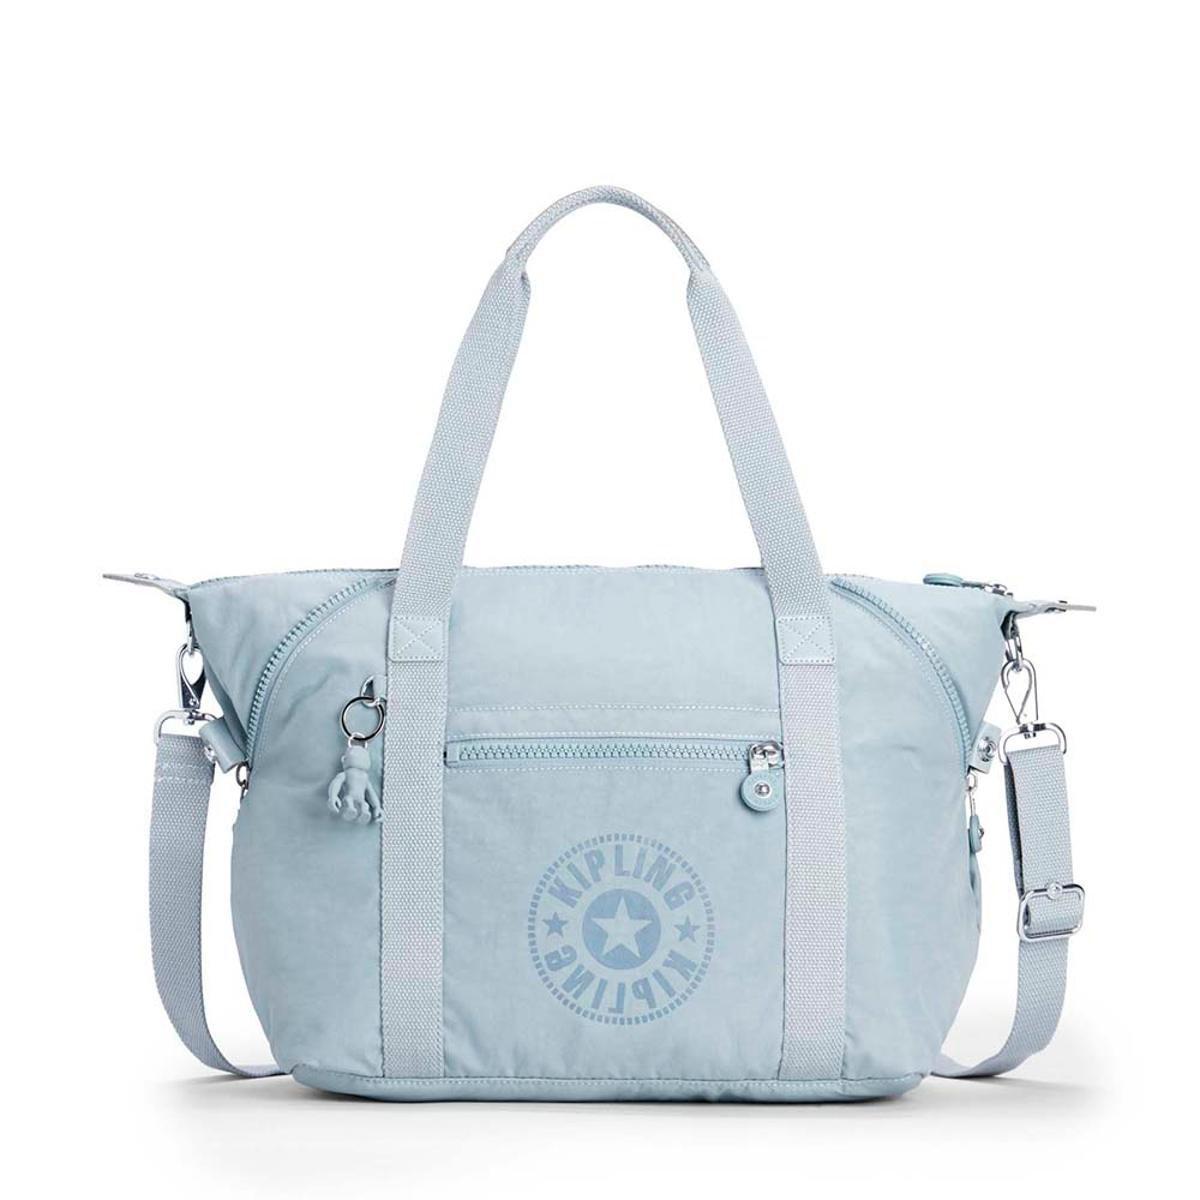 7cf964d2f Bolsa Kipling Art Feminina - Azul - Compre Agora | Netshoes